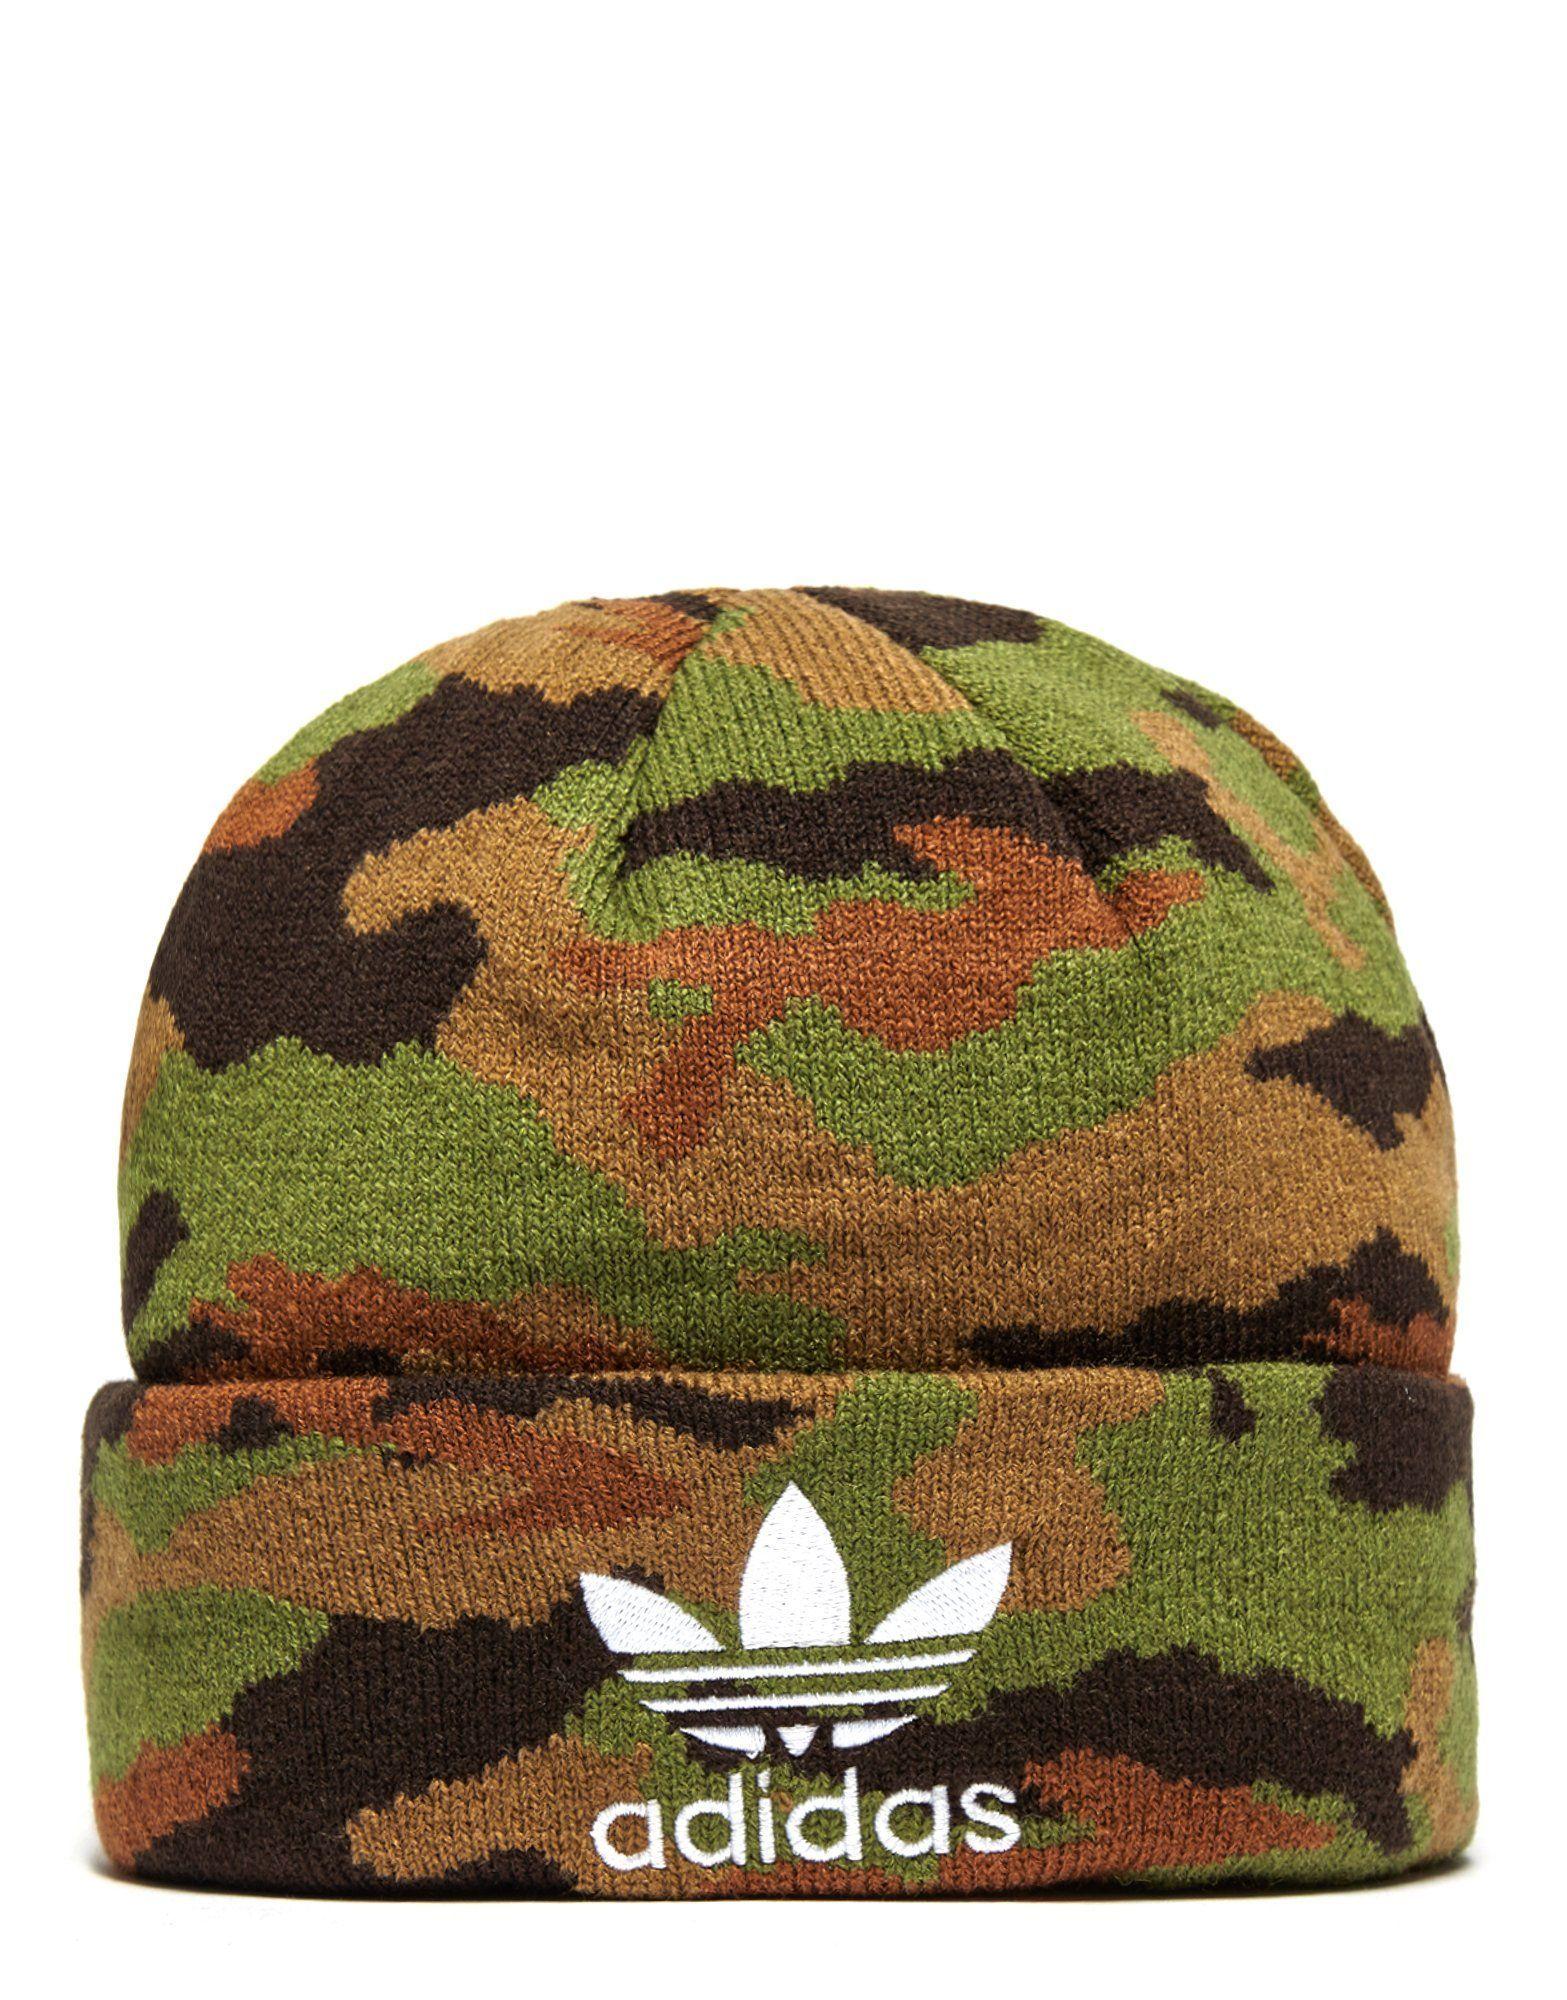 0fdb9a3d9 adidas Originals Camouflage Beanie Hat | JD Sports | Adidas | Beanie ...